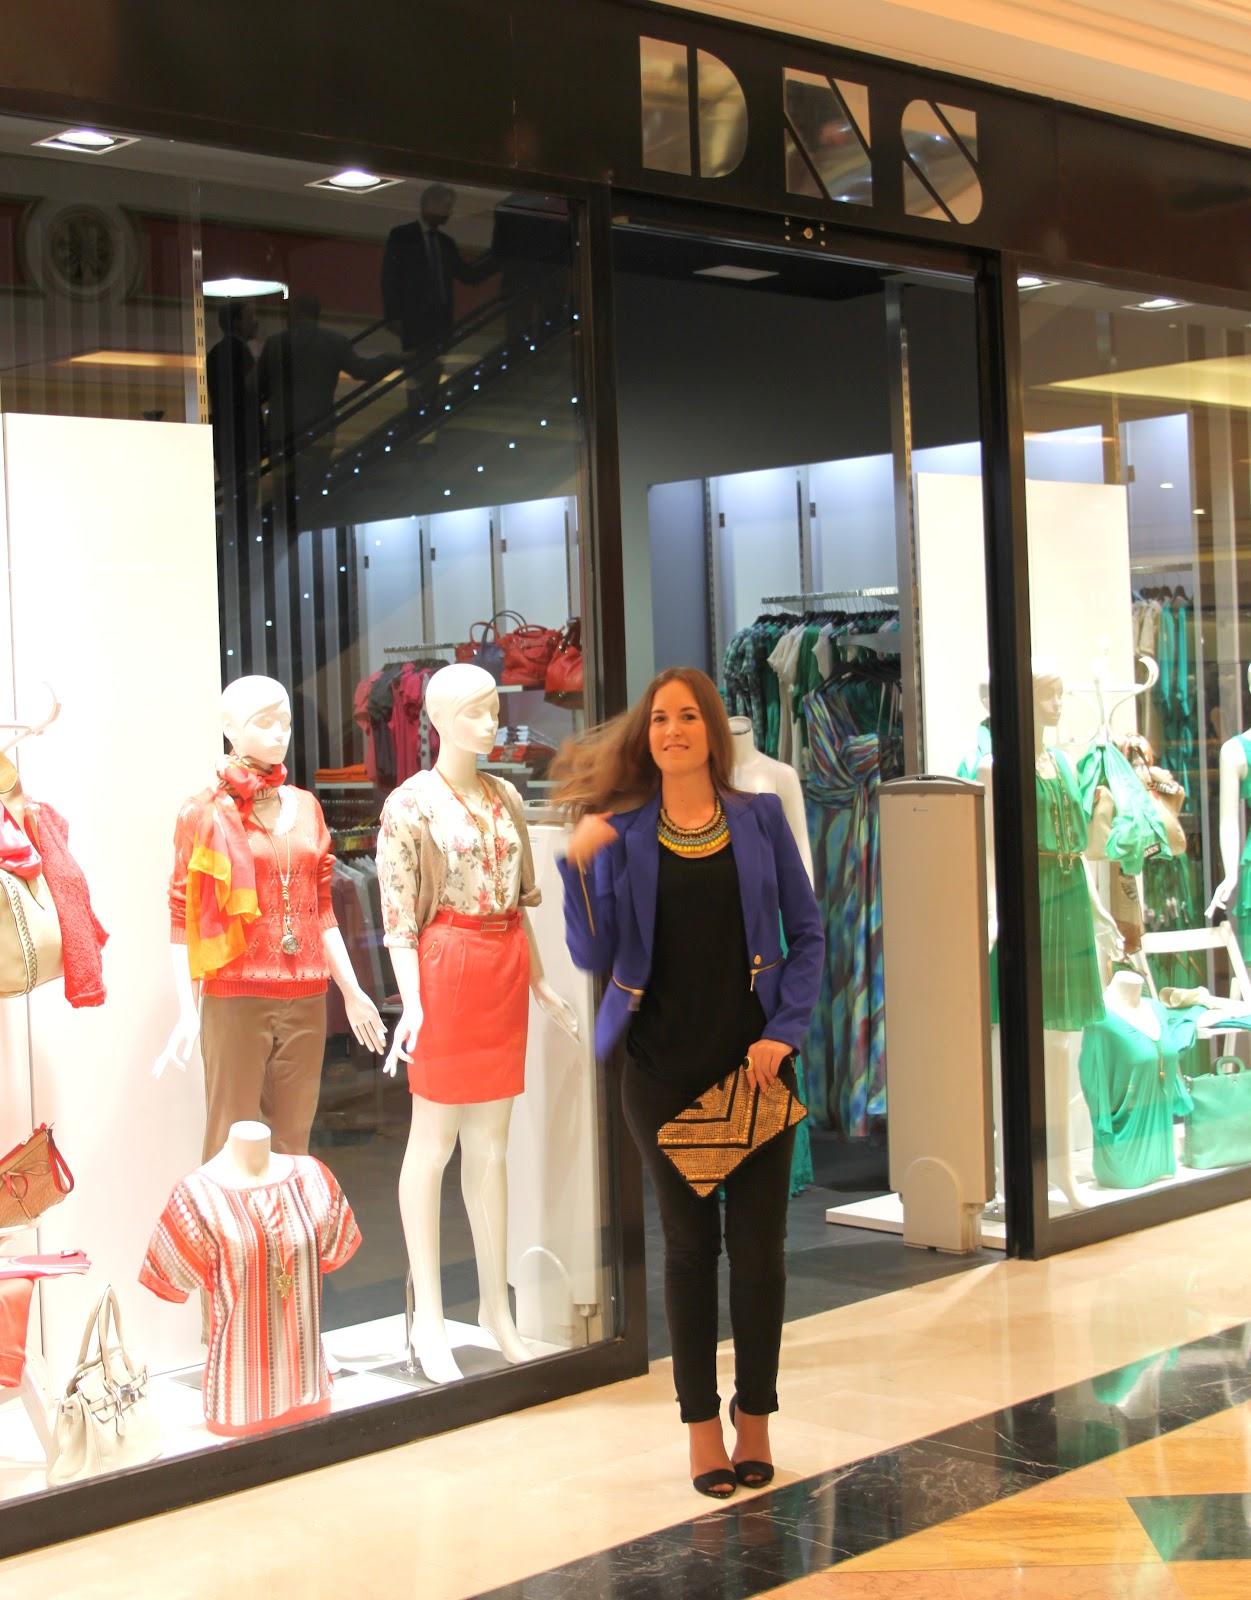 Helene 39 s wardrobe apertura nueva tienda dns en c c gran - Cc gran plaza majadahonda ...